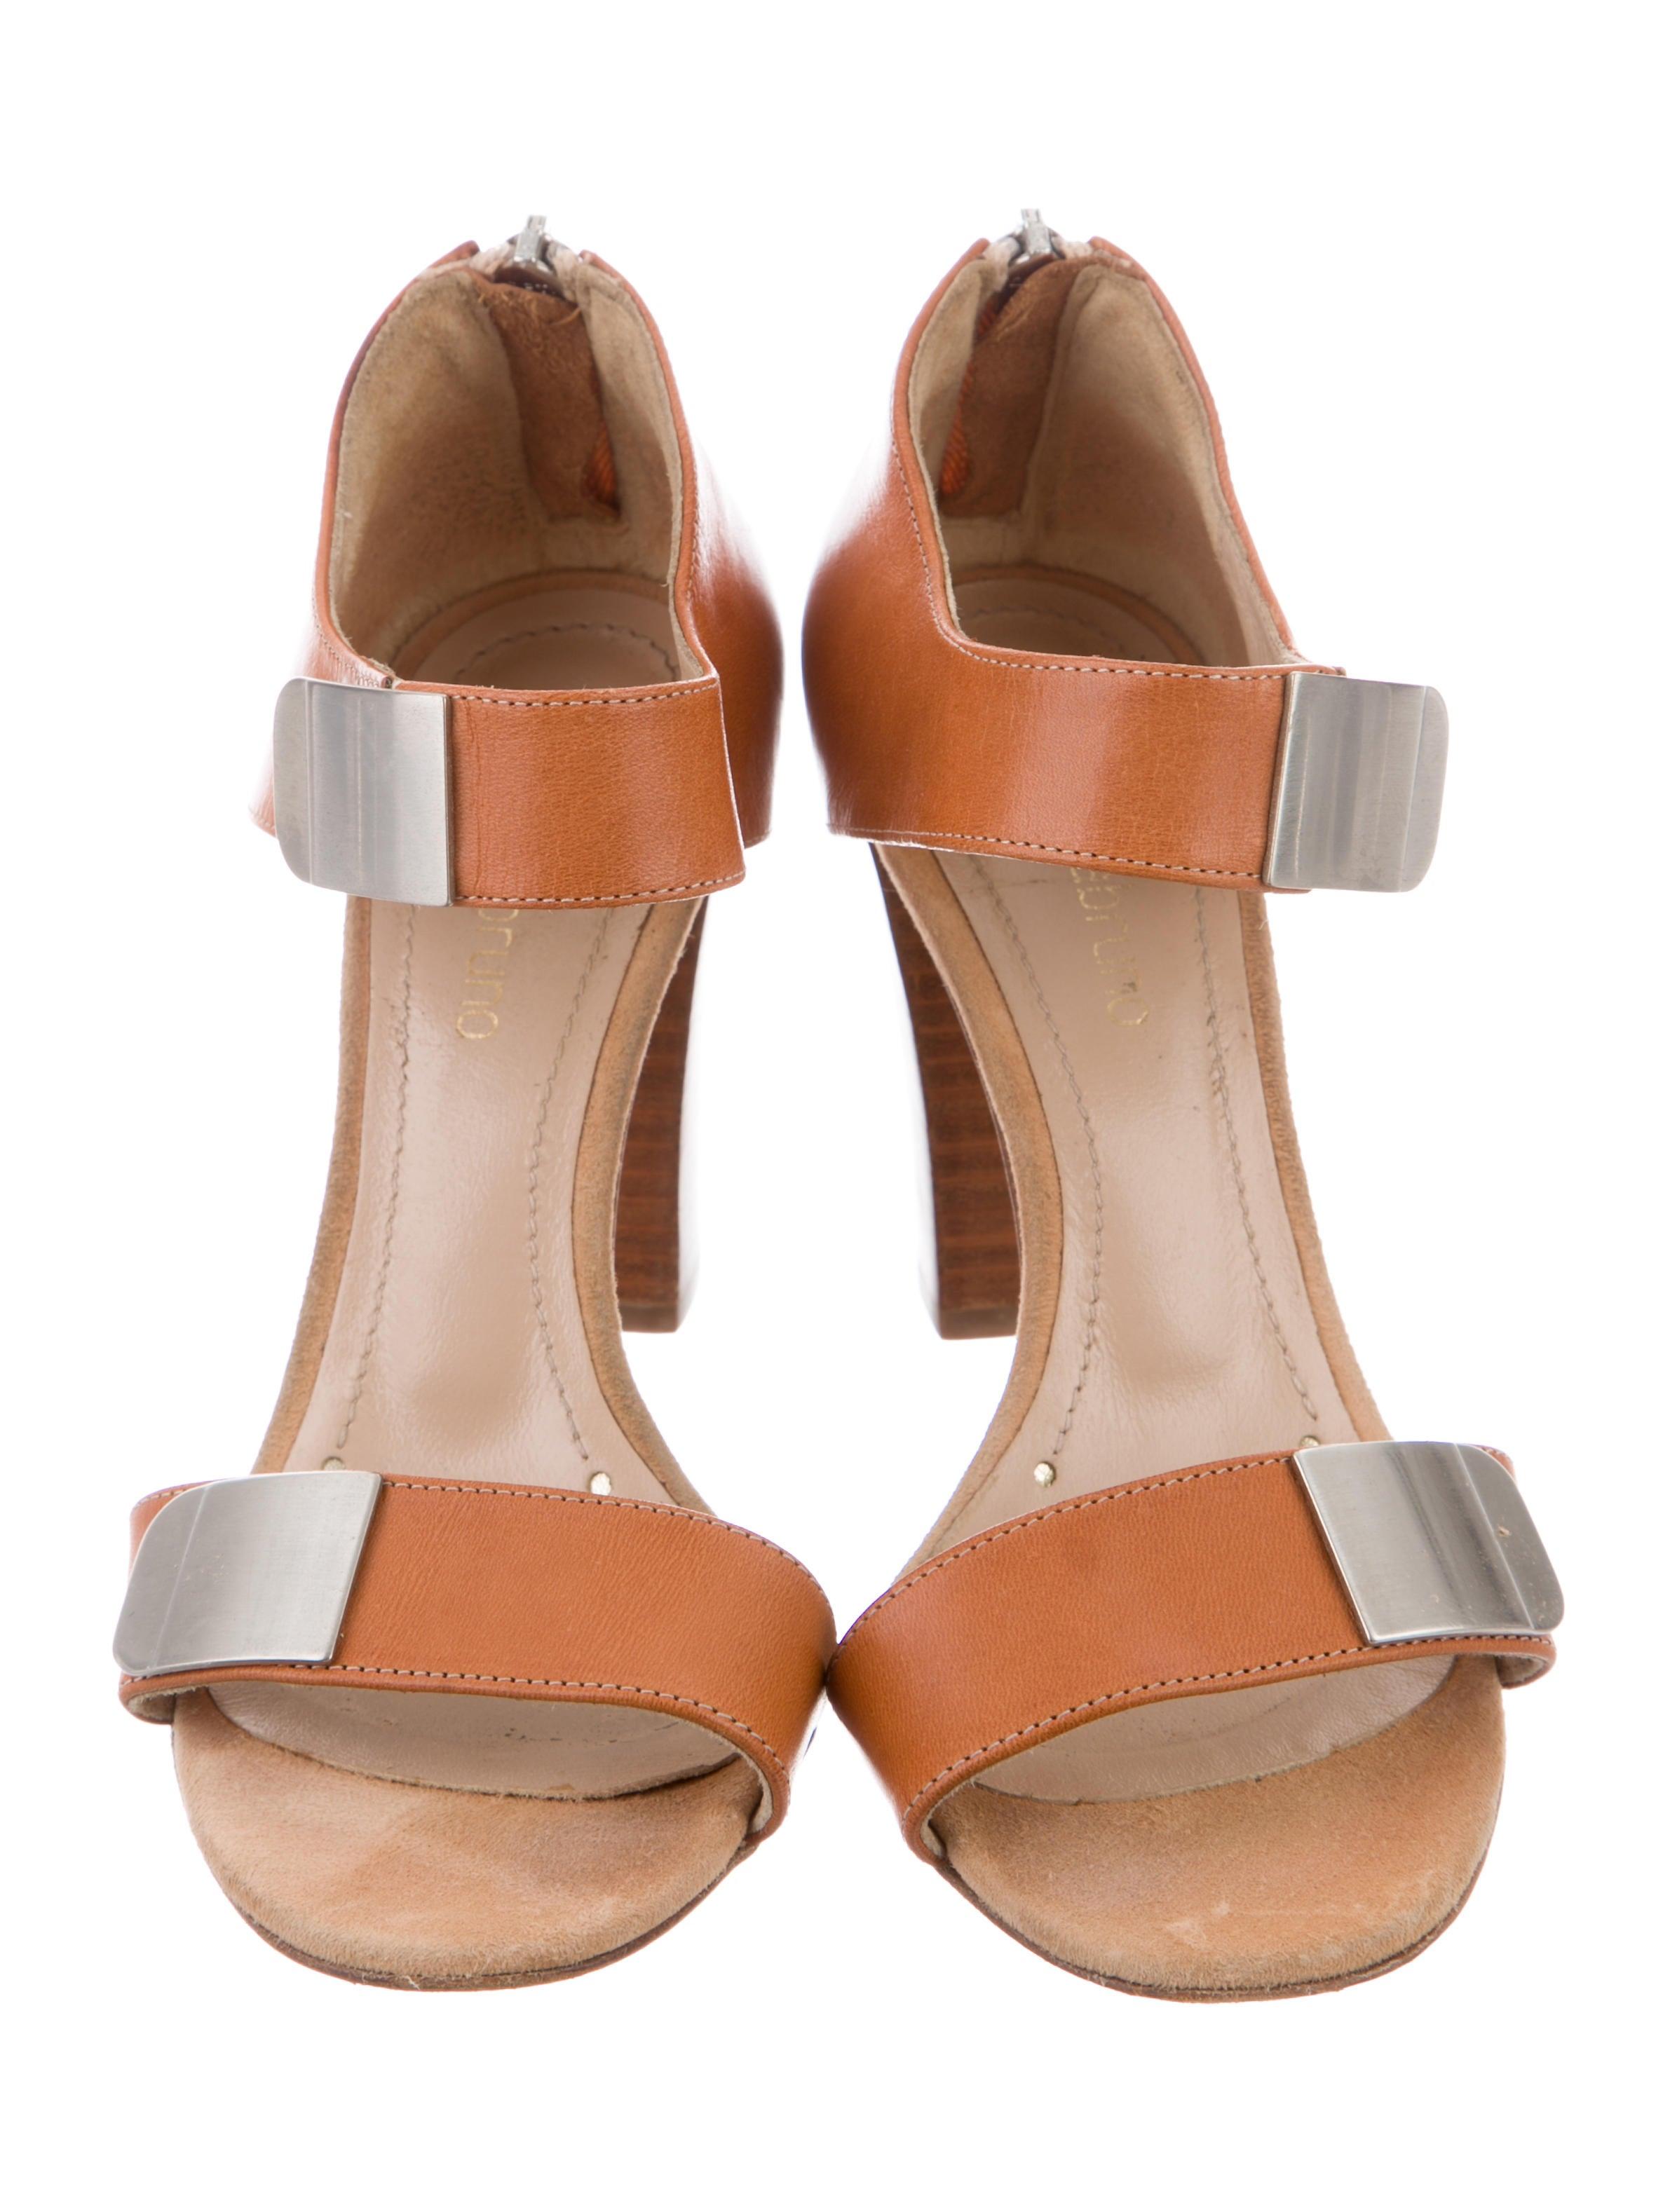 Vanessa Bruno Leather Multistrap Sandals clearance online ebay xTqFA